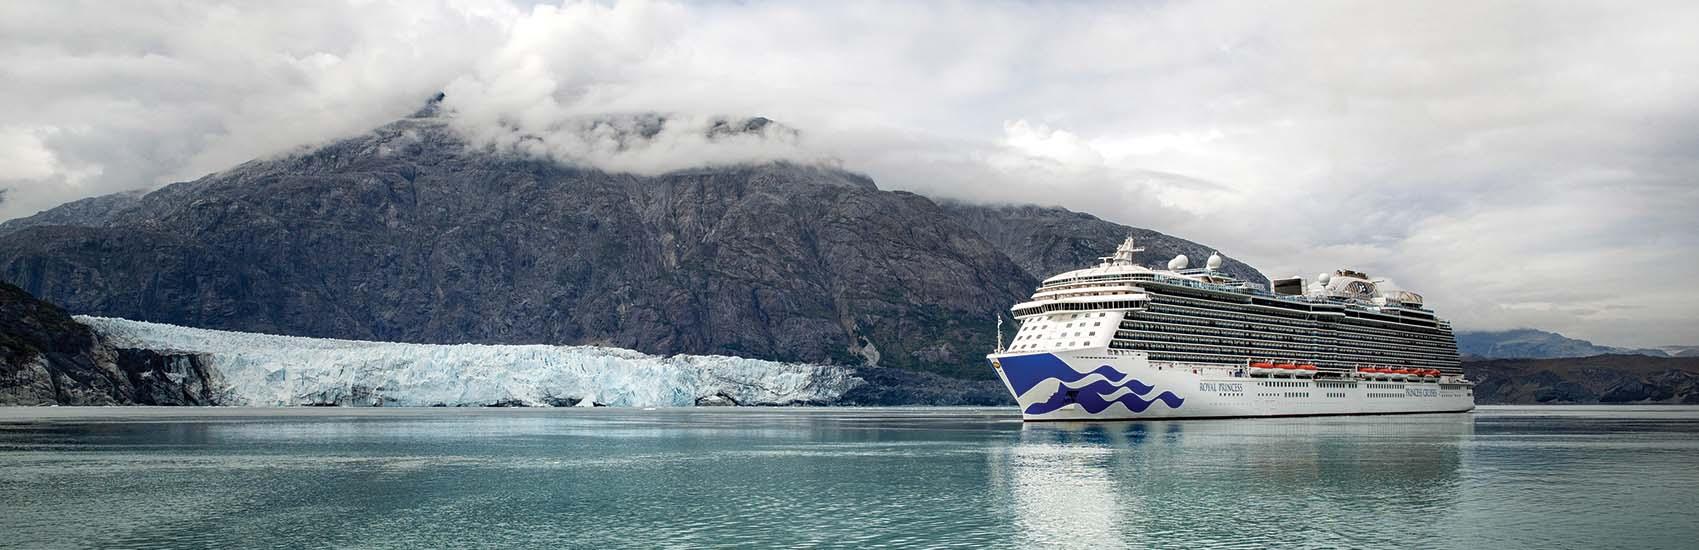 Princess is Sailing to Alaska Summer 2021 0